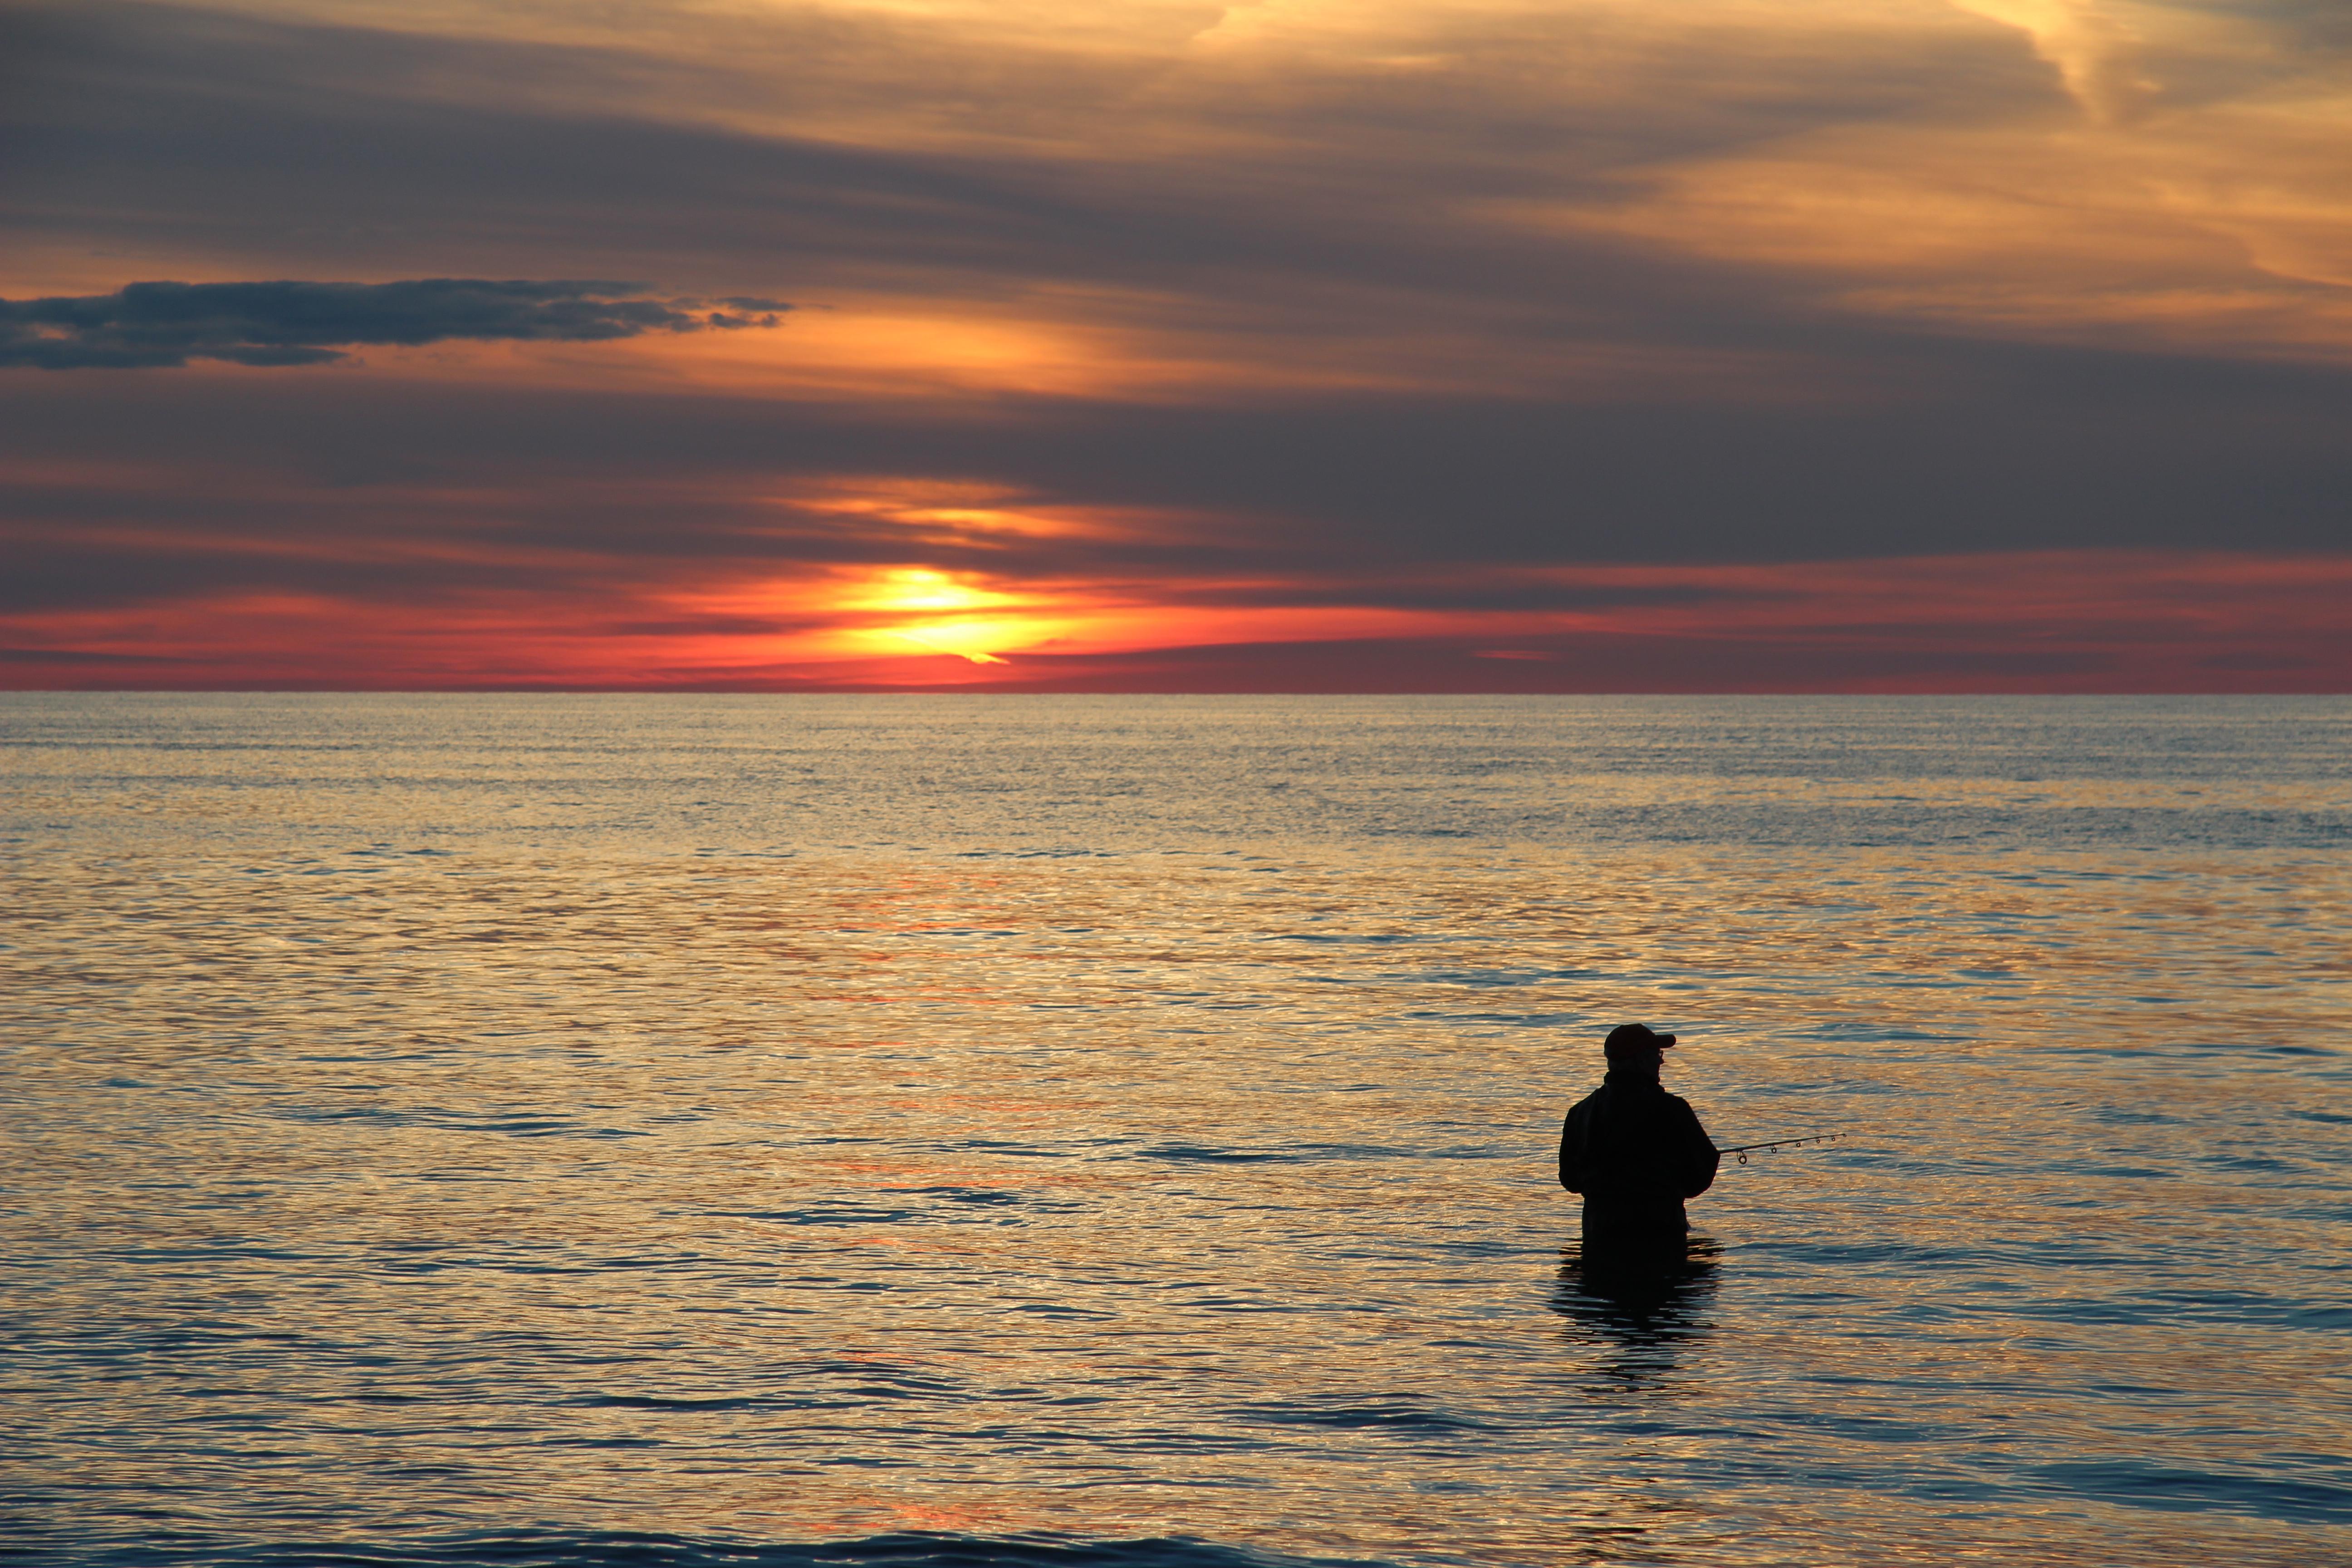 Port Albert Fishing at Sunset